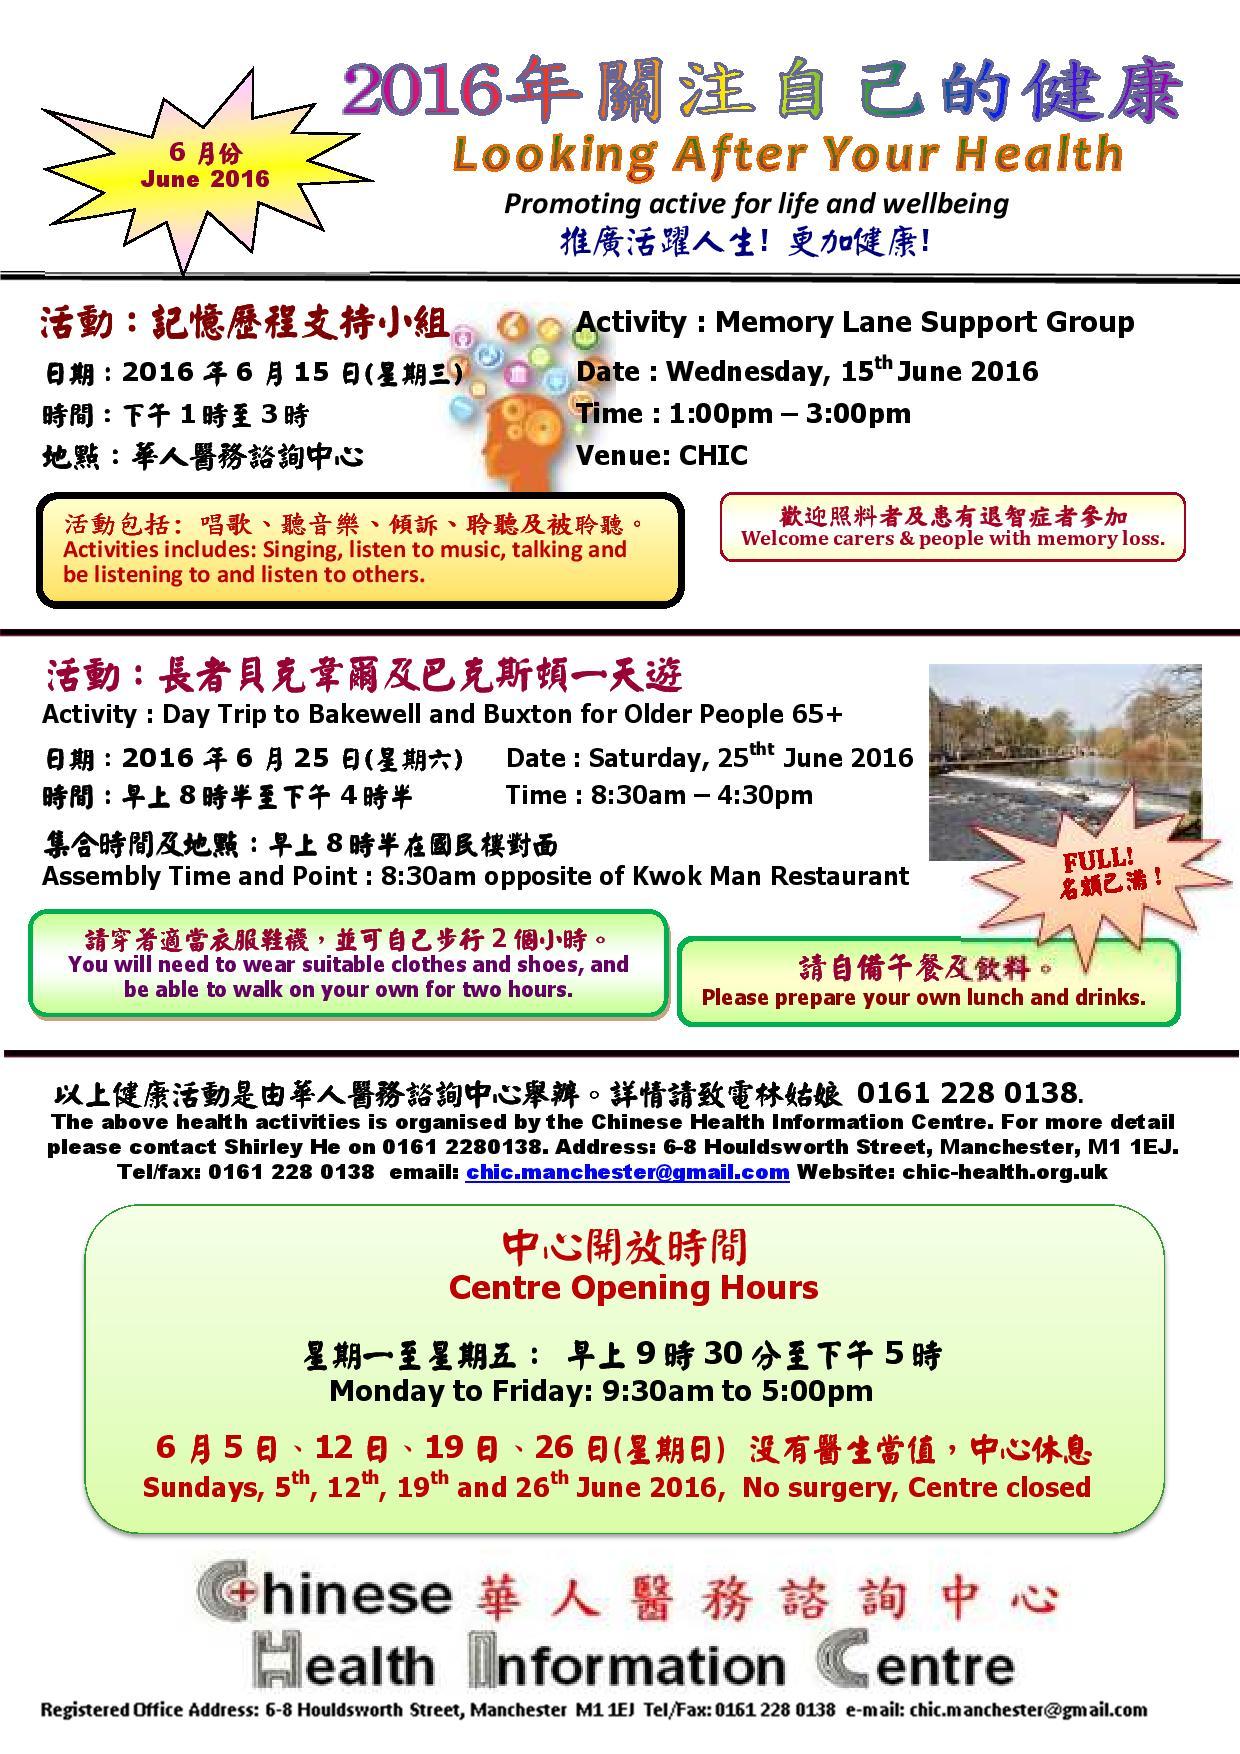 July 2016 Health Programme